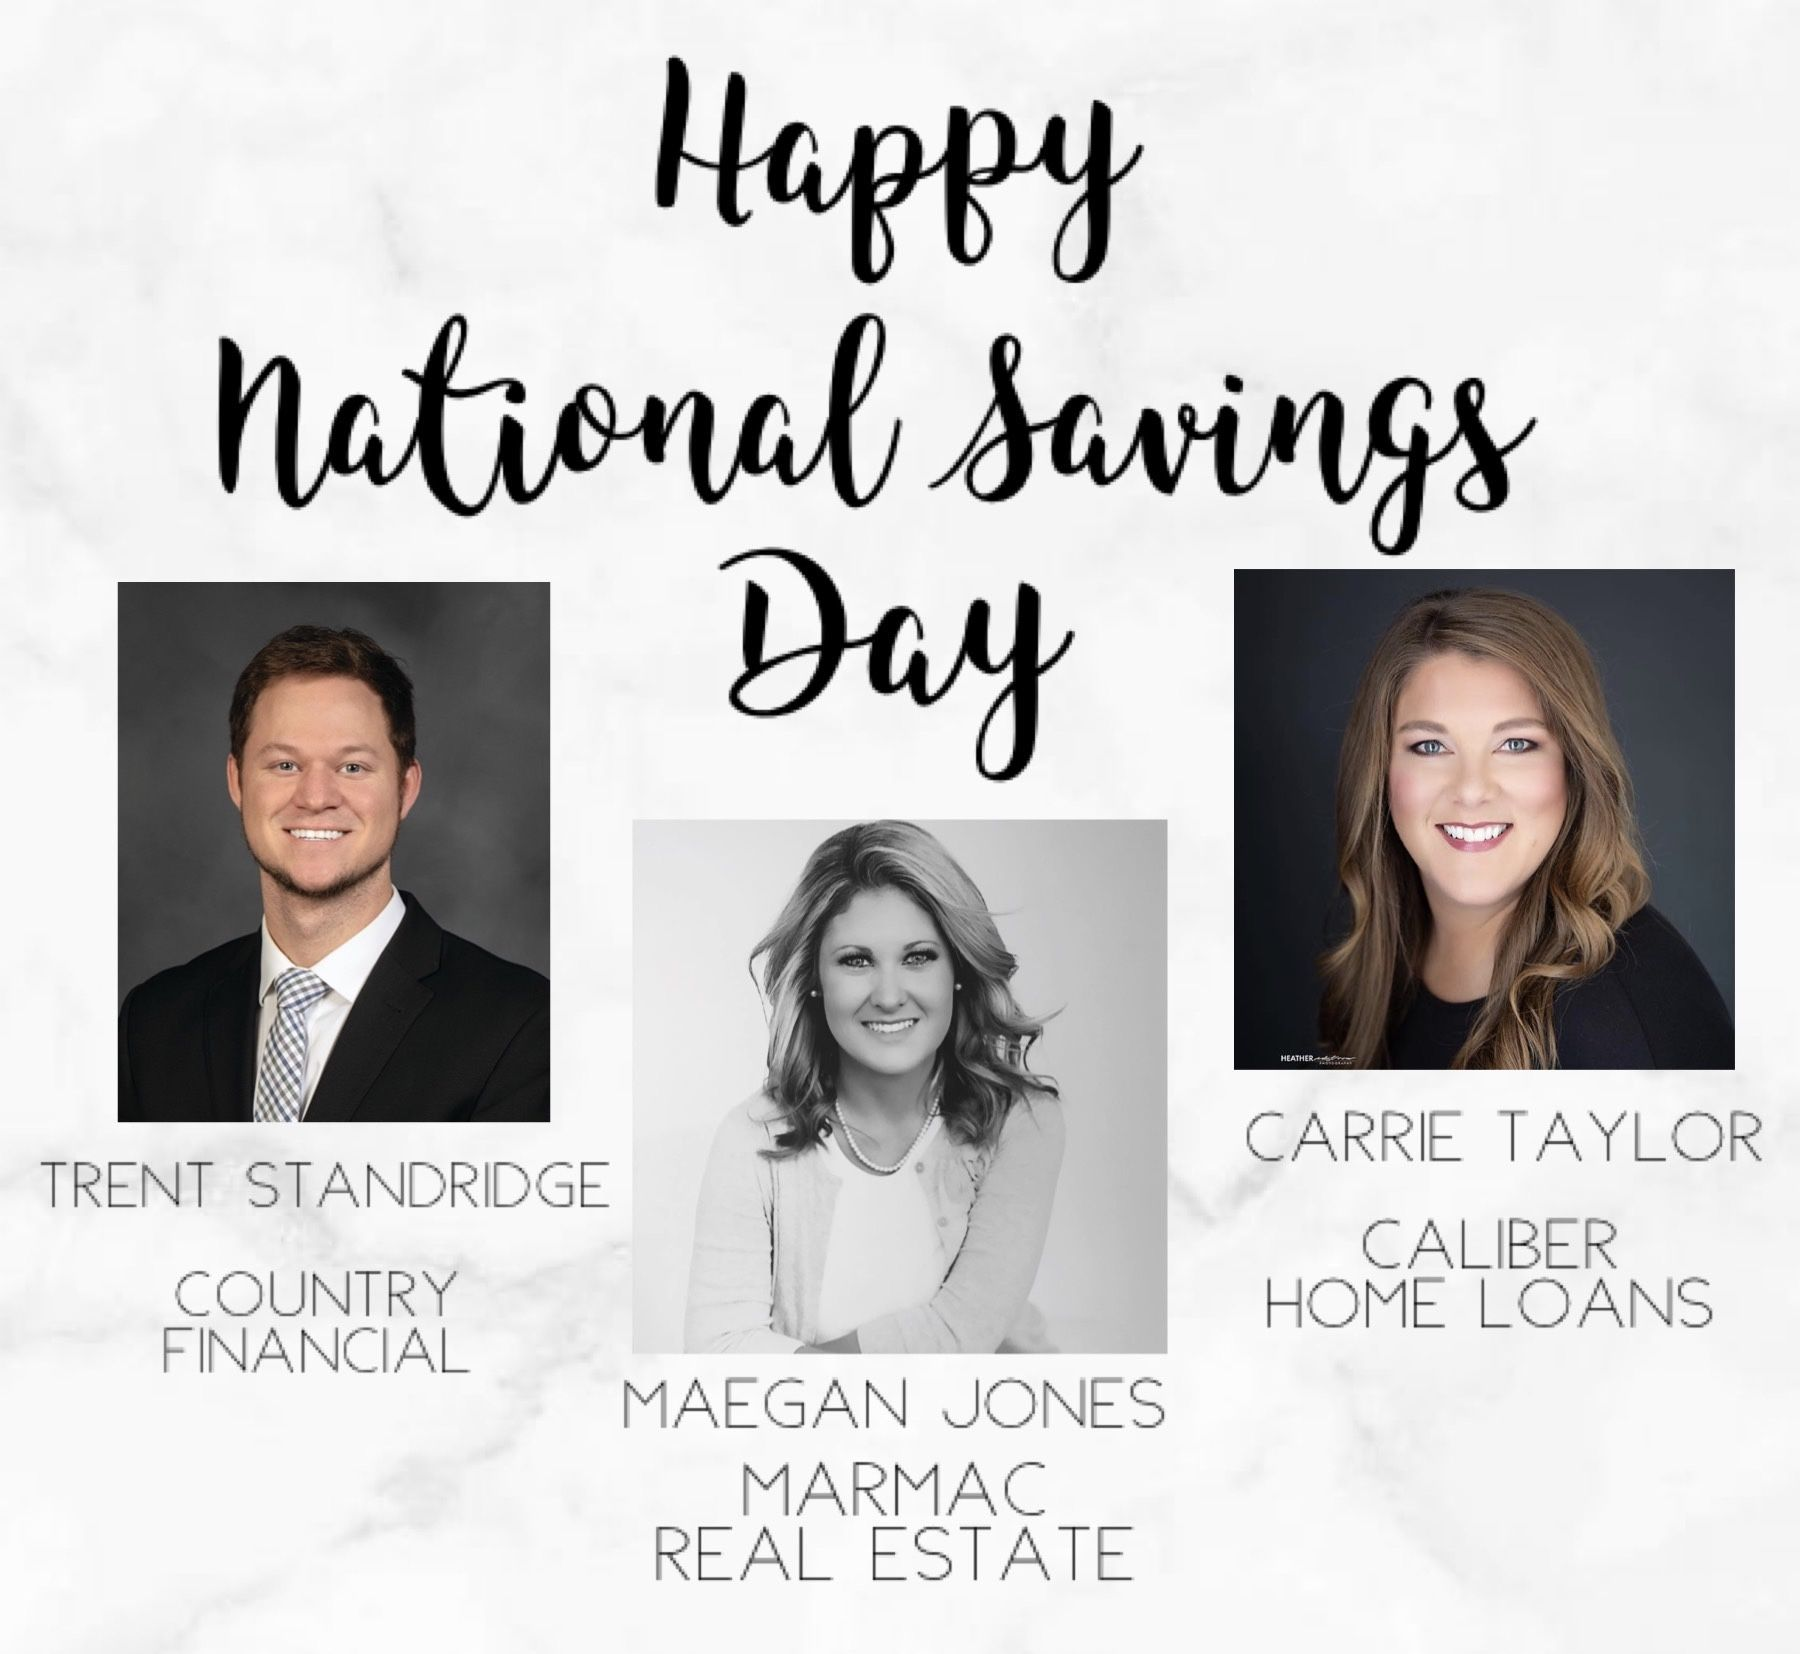 Happy National Savings Day